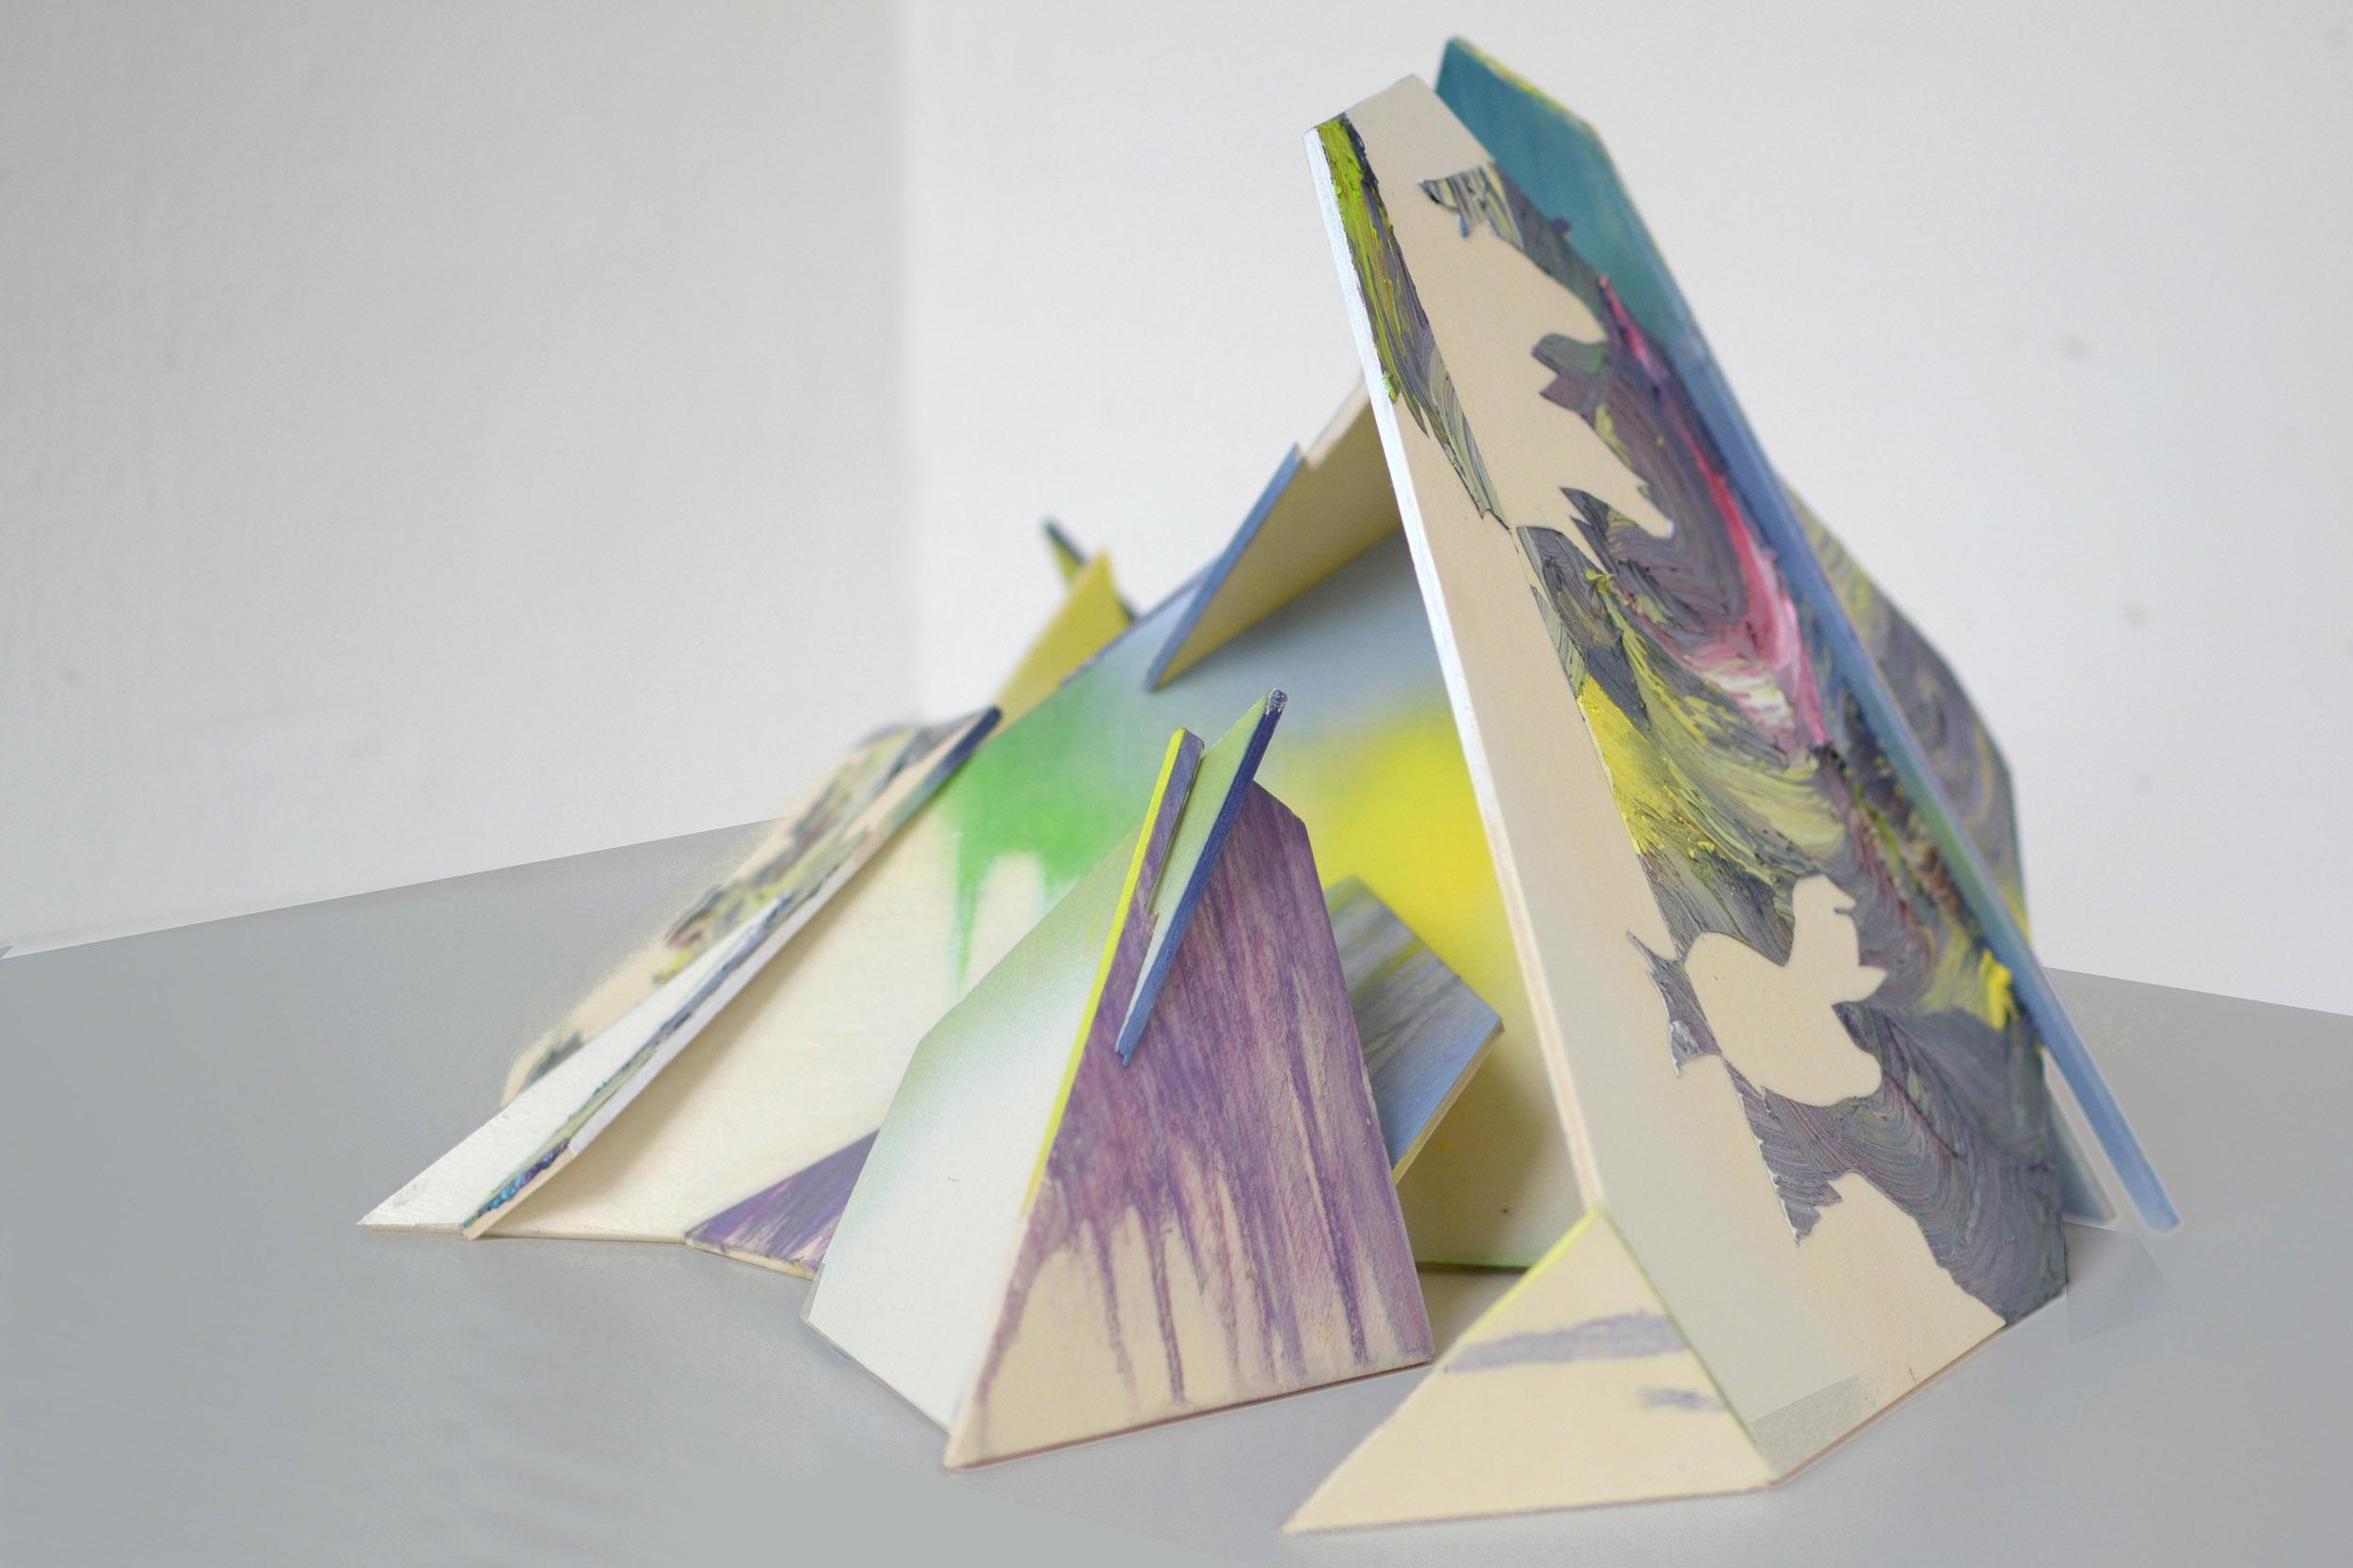 Fluh  30 x 60 x 40 cm mixed media, 2013